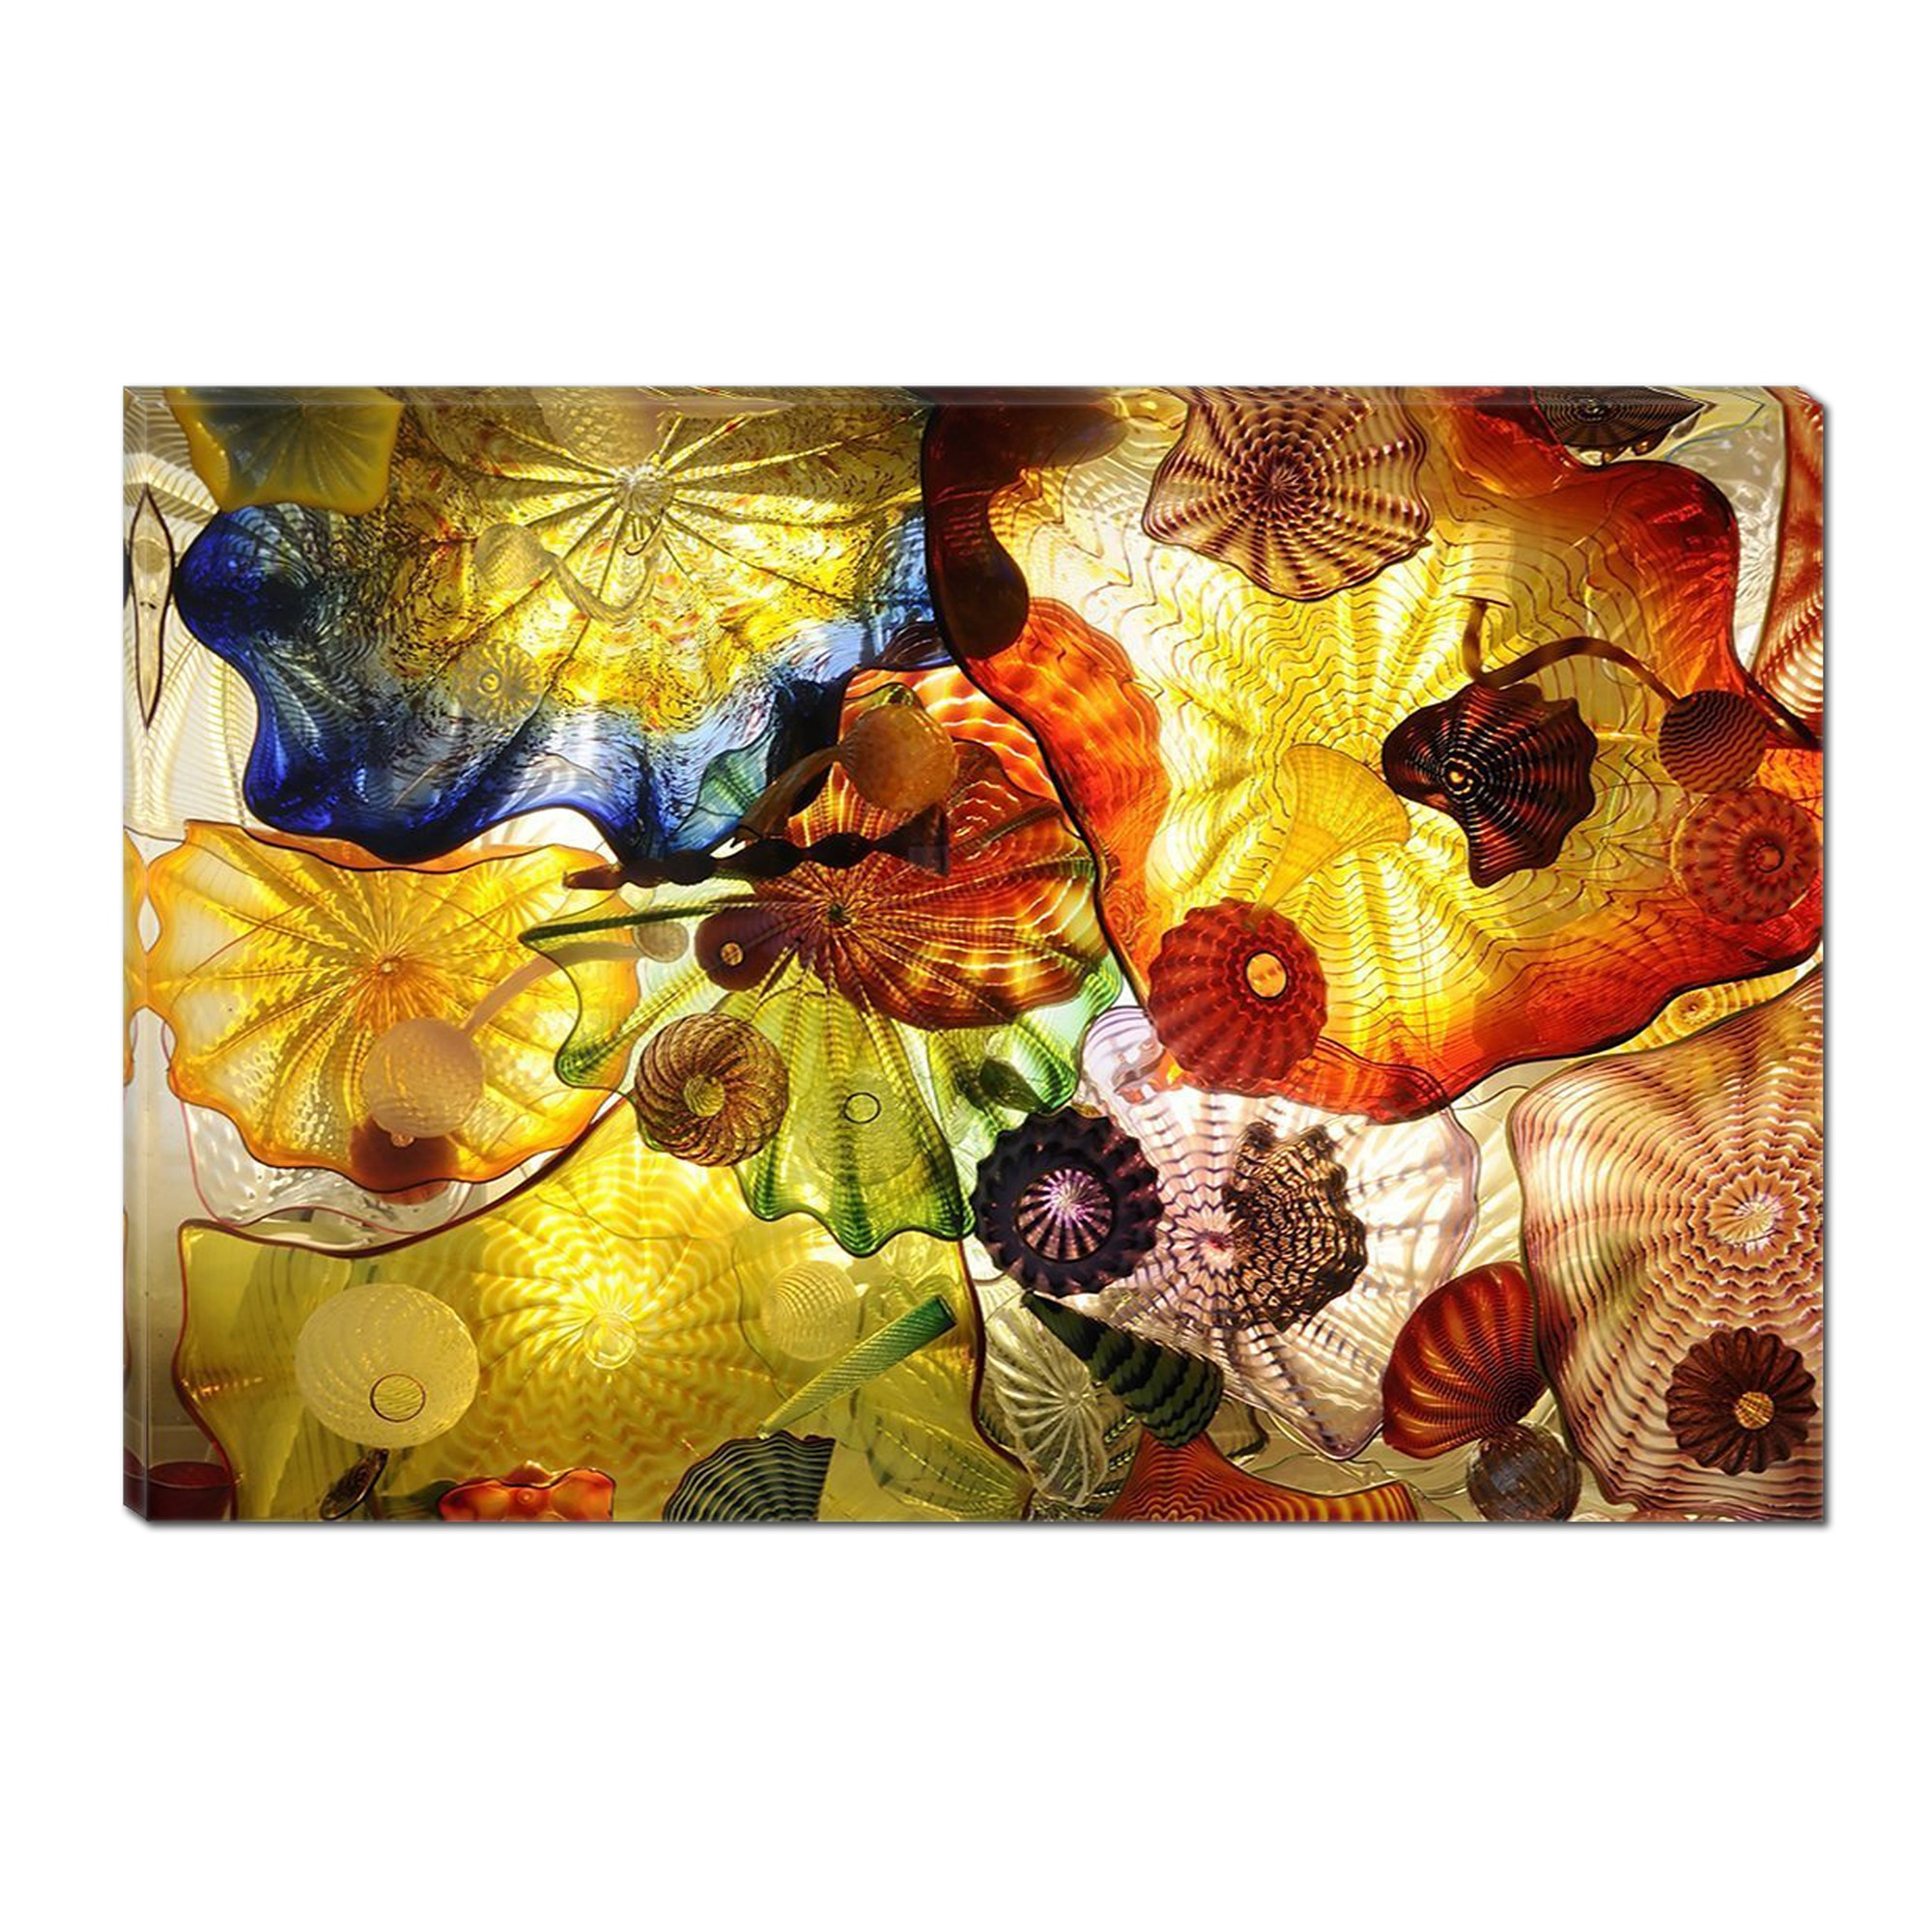 Fotografie Tablou DualView Startonight Abstract Rosu, Luminos in intuneric, 70 x 100 cm